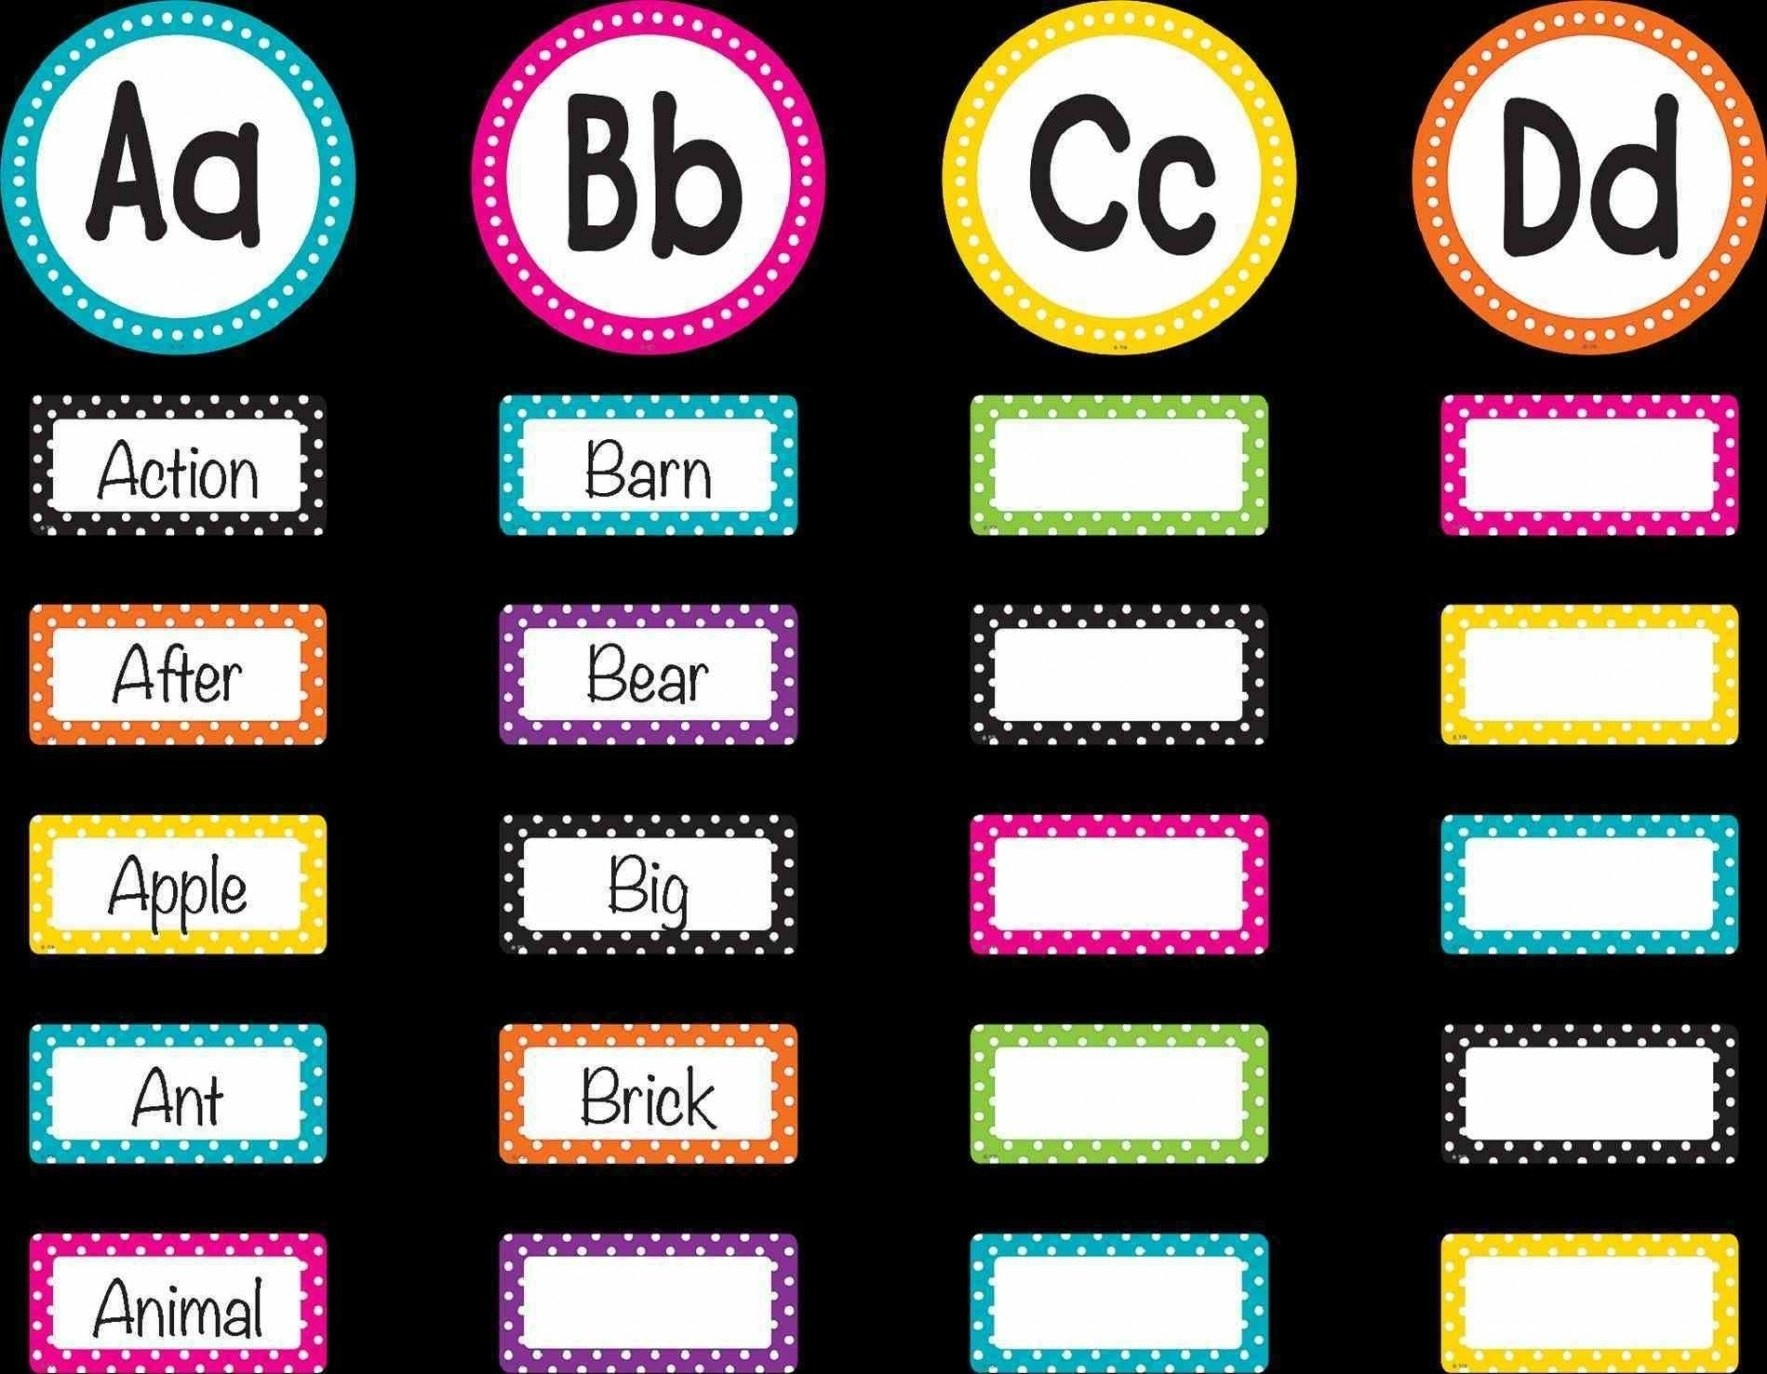 Free Printable Bulletin Board Letters Pdf Penaime Com - Free Printable Bulletin Board Letters